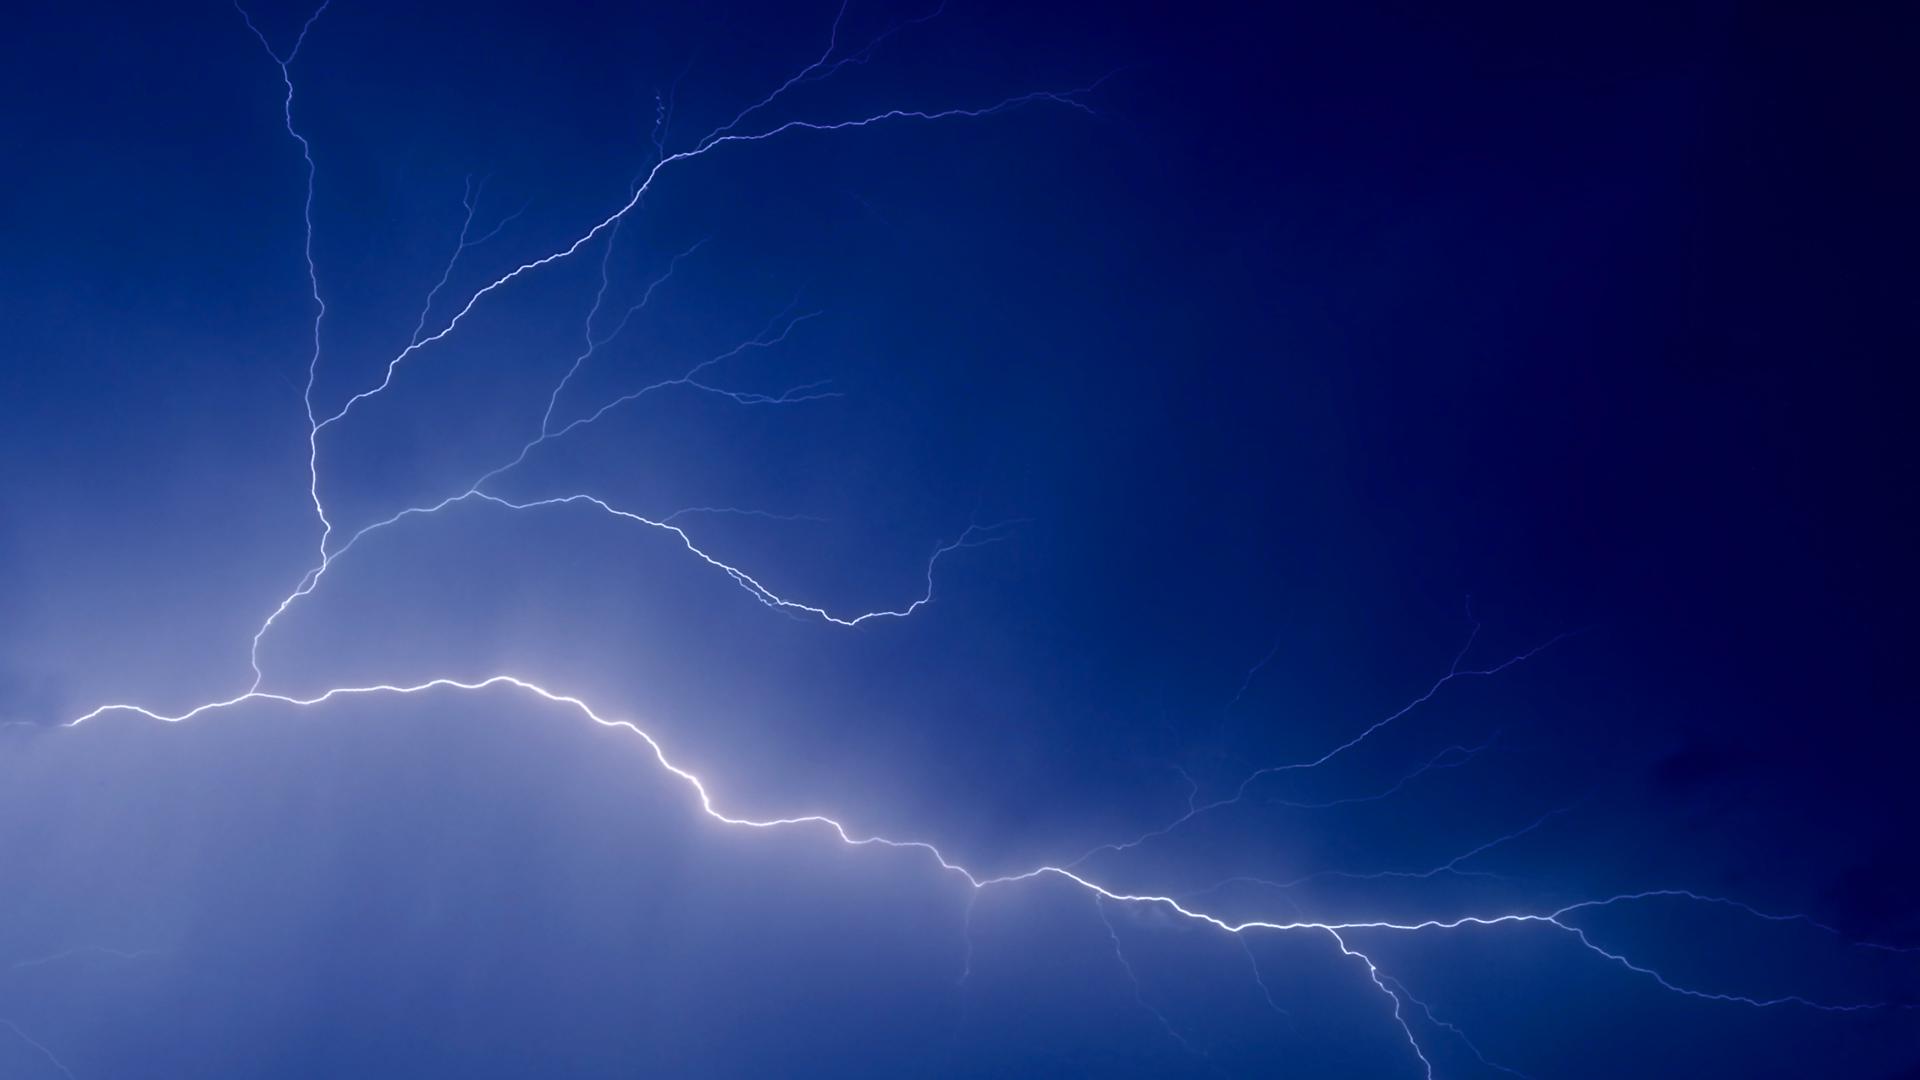 Lightning Streaks Wallpapers 1920x1080